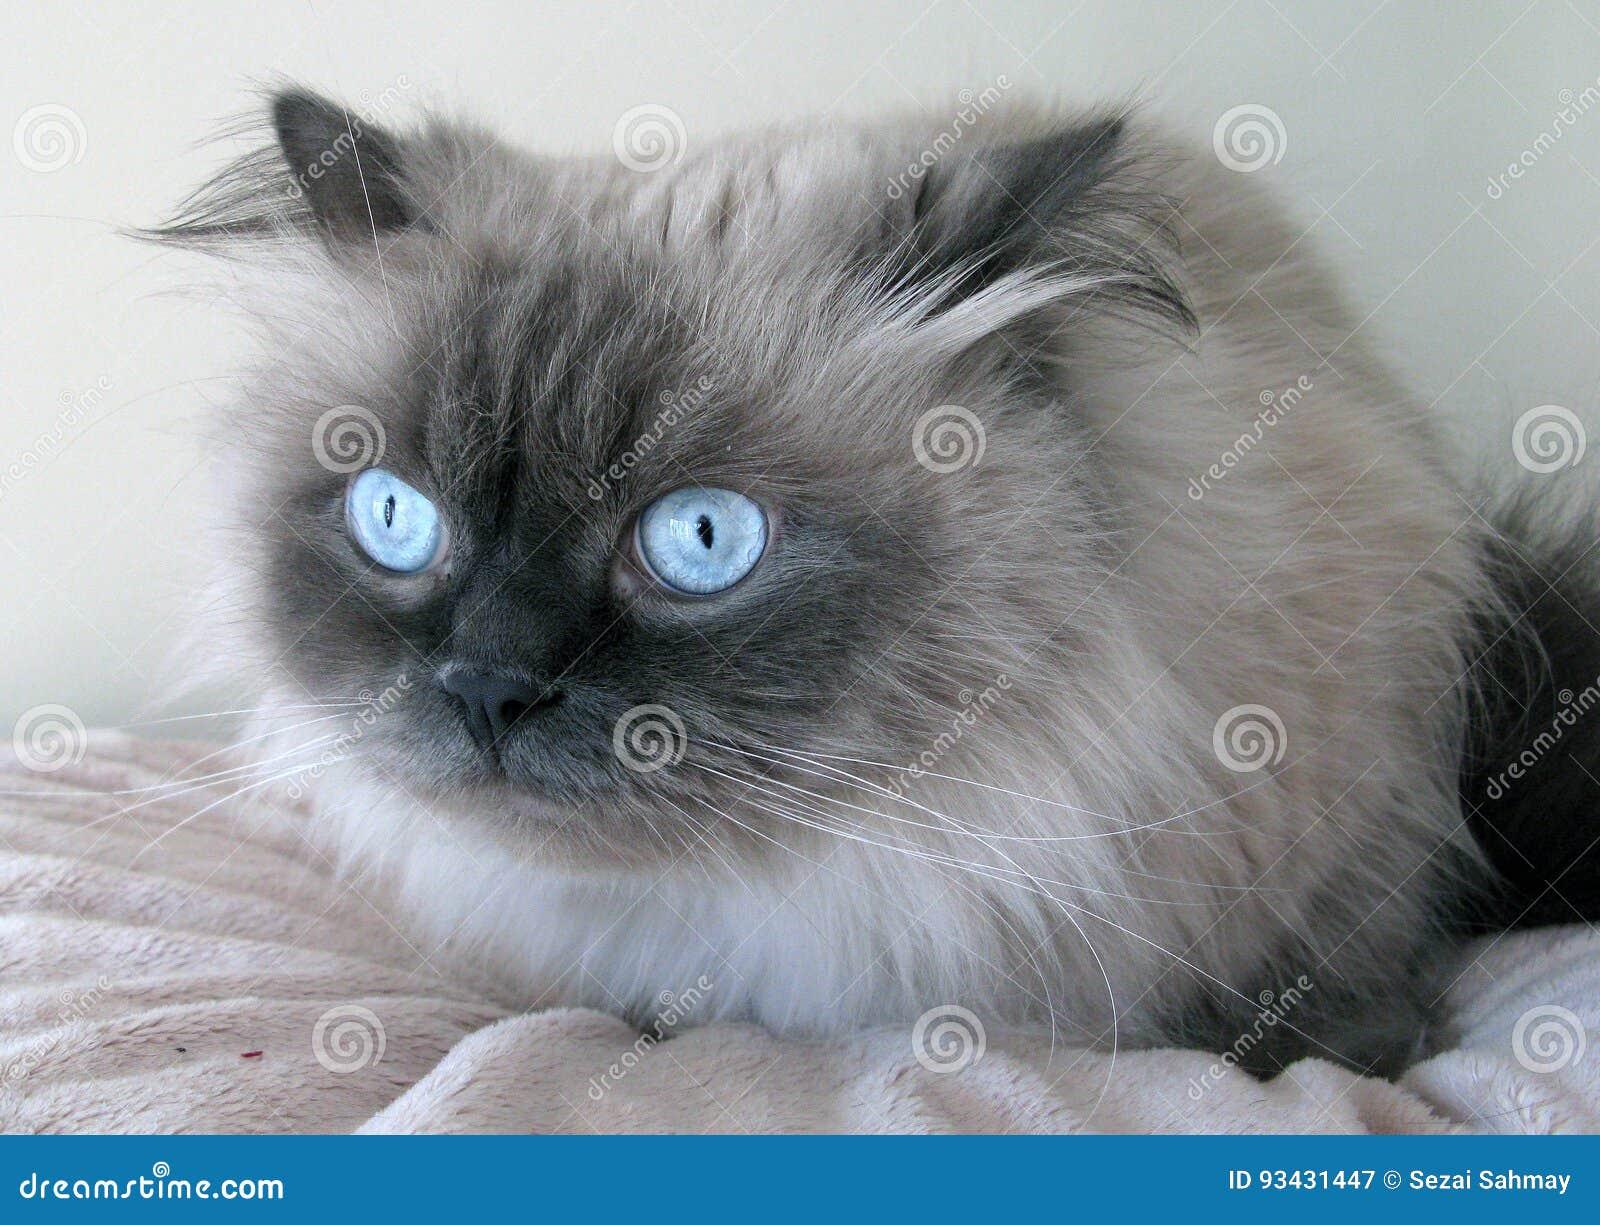 Himalayan Cat Stock Image Image Of Mammalian Were Animal